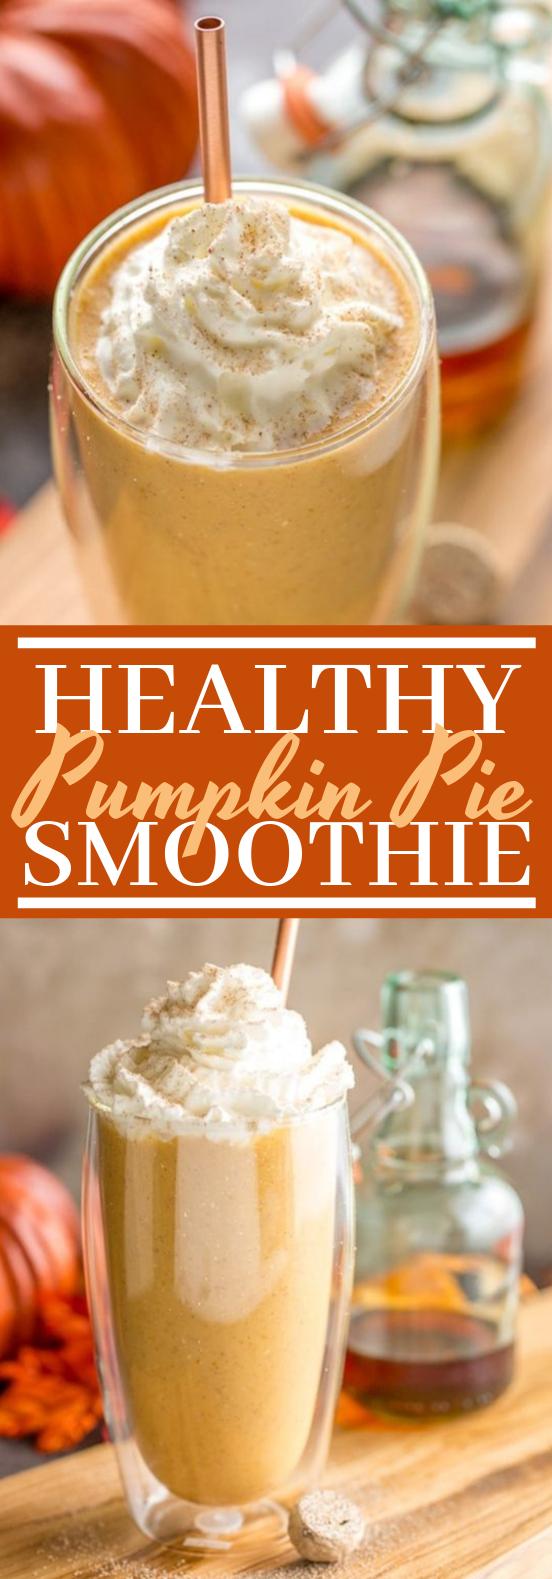 Healthy Pumpkin Pie Smoothie #drinks #fall